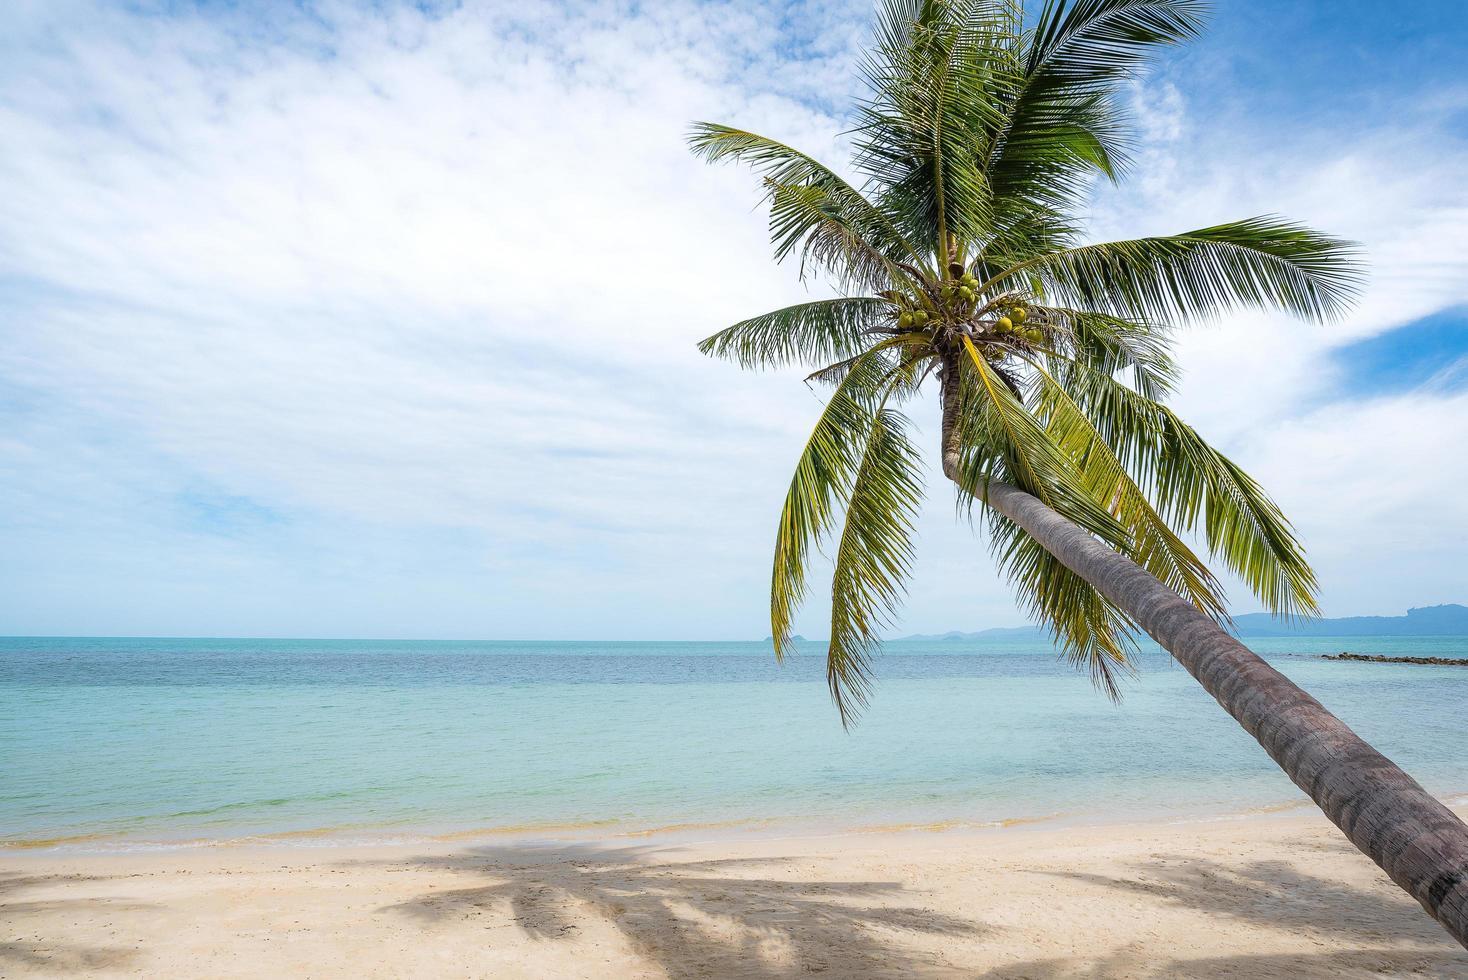 palmeira na praia tropical foto